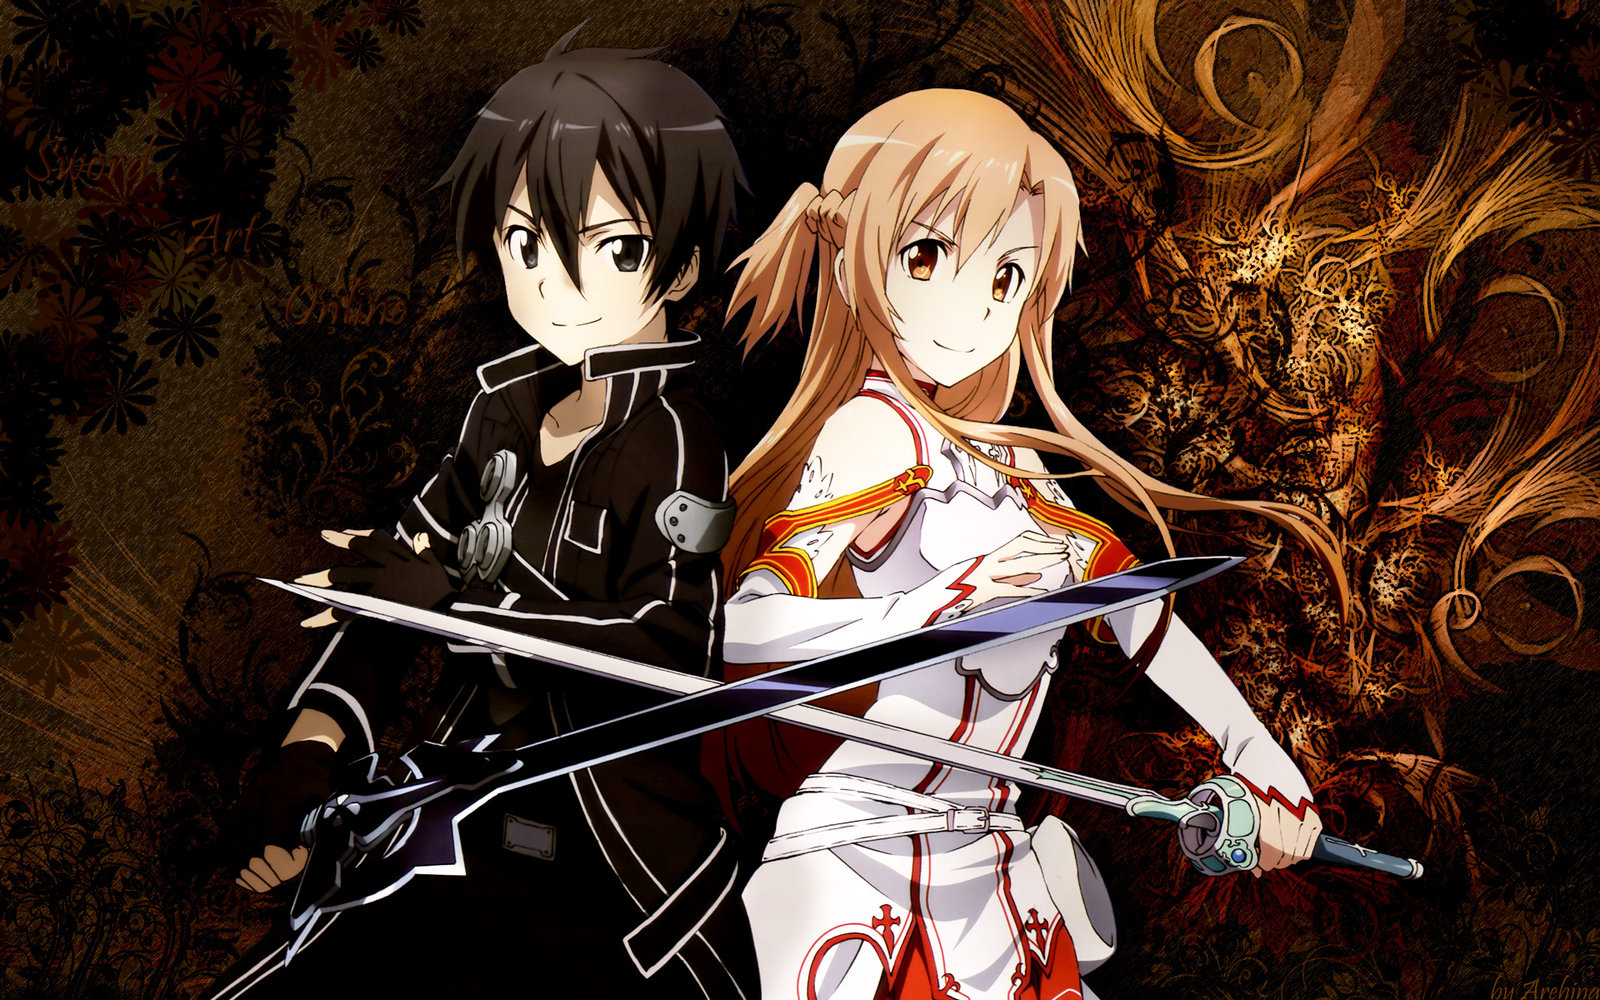 48 Sword Art Online Asuna Wallpaper On Wallpapersafari